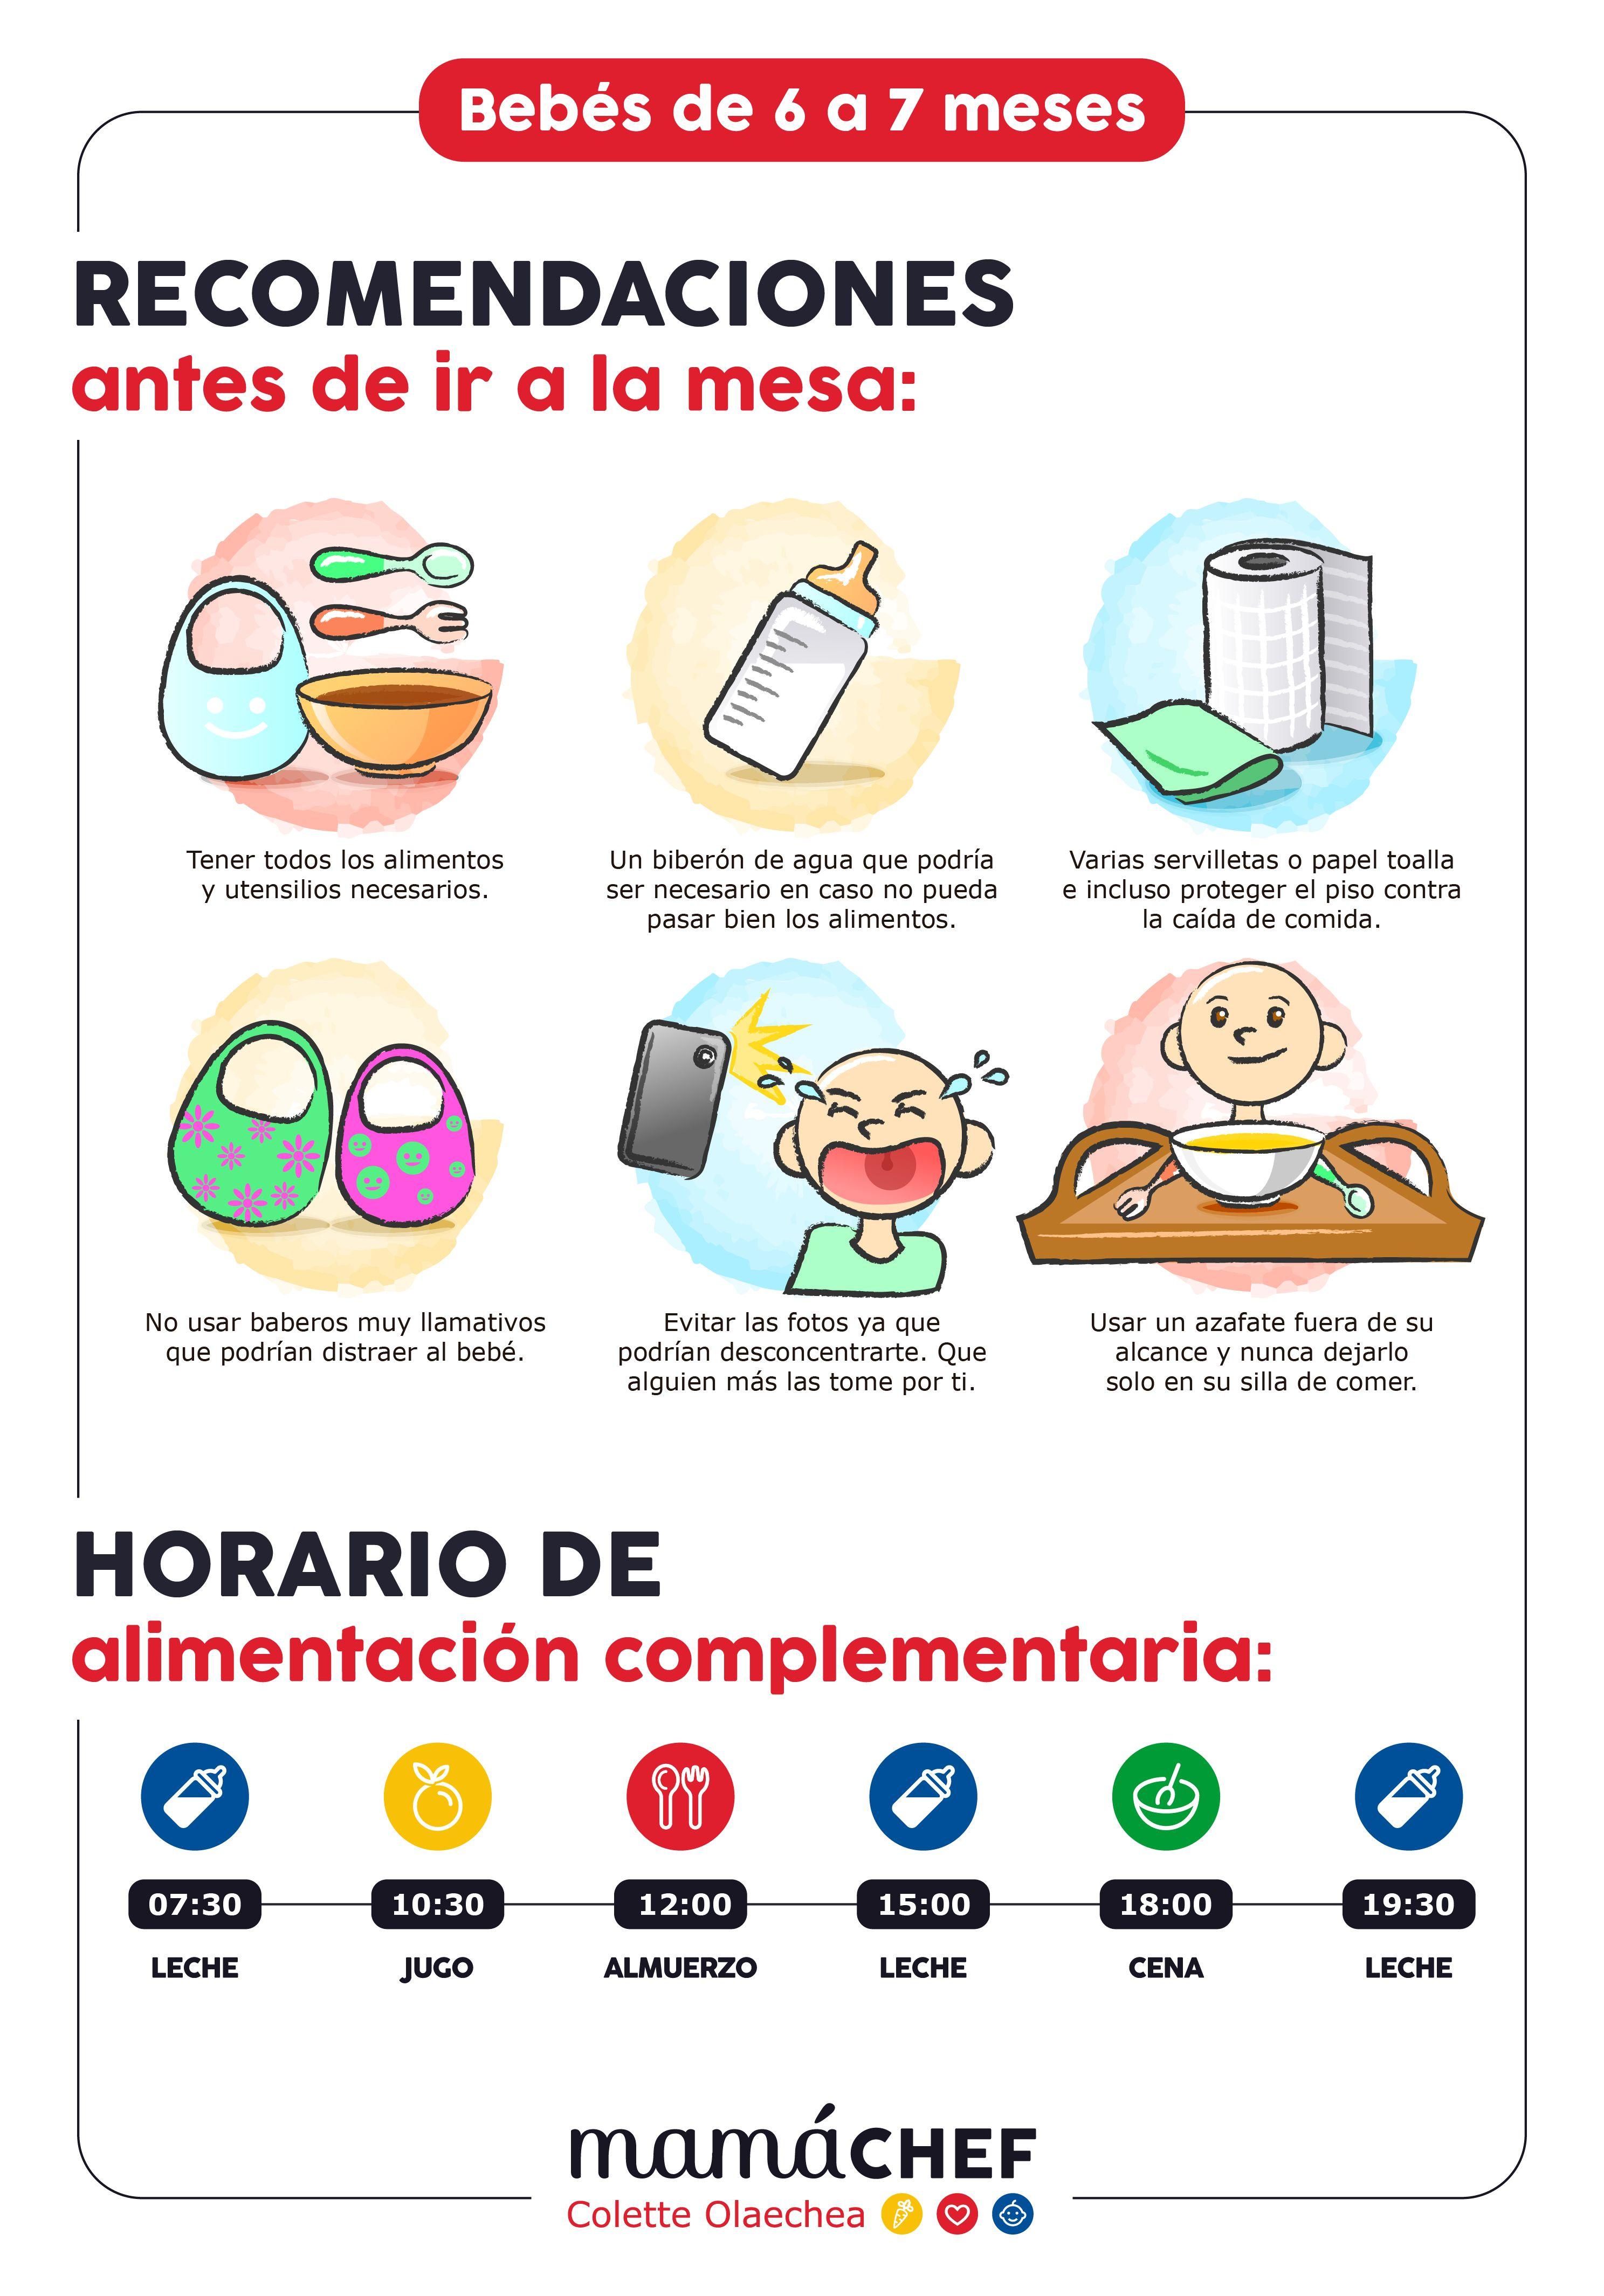 Imagen Sobre Comida Bebe 6 Meses De Colette Olaechea En Mama Chef